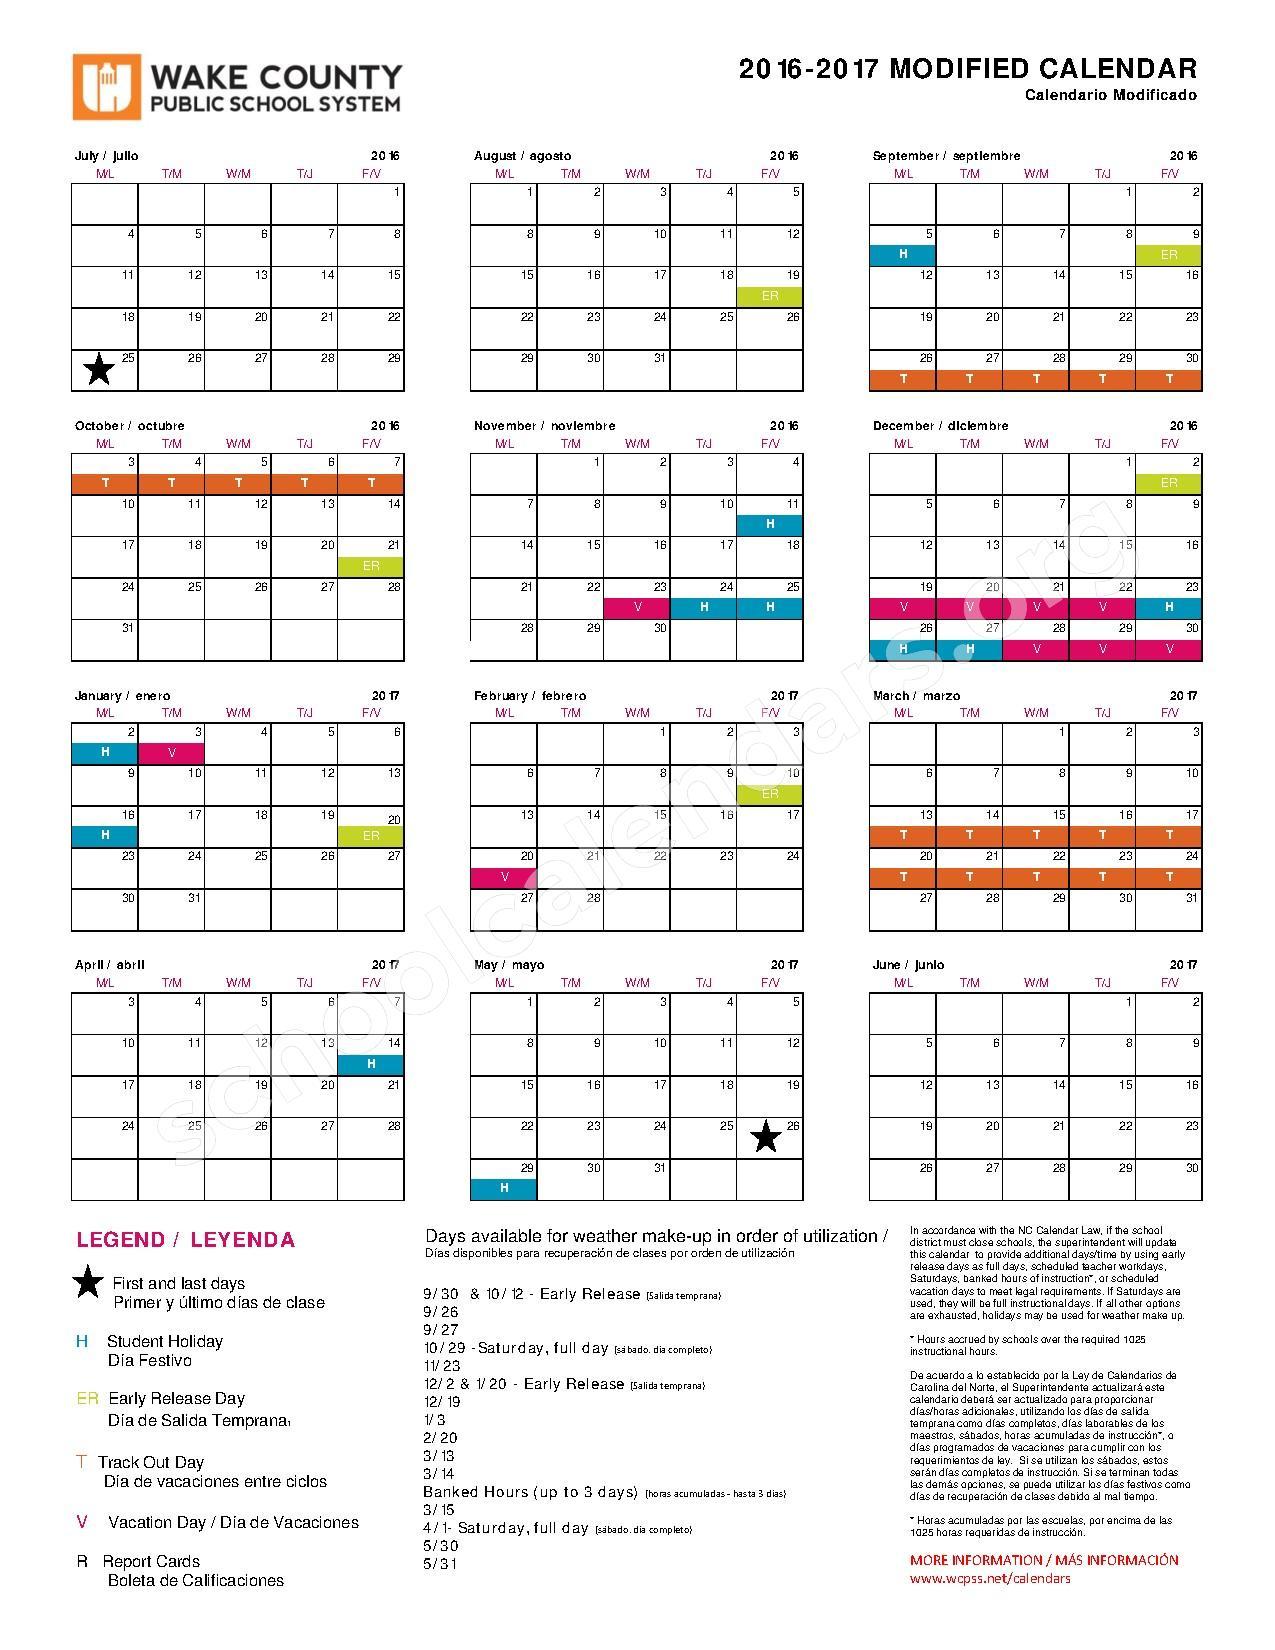 Wake County School Calendar 2017